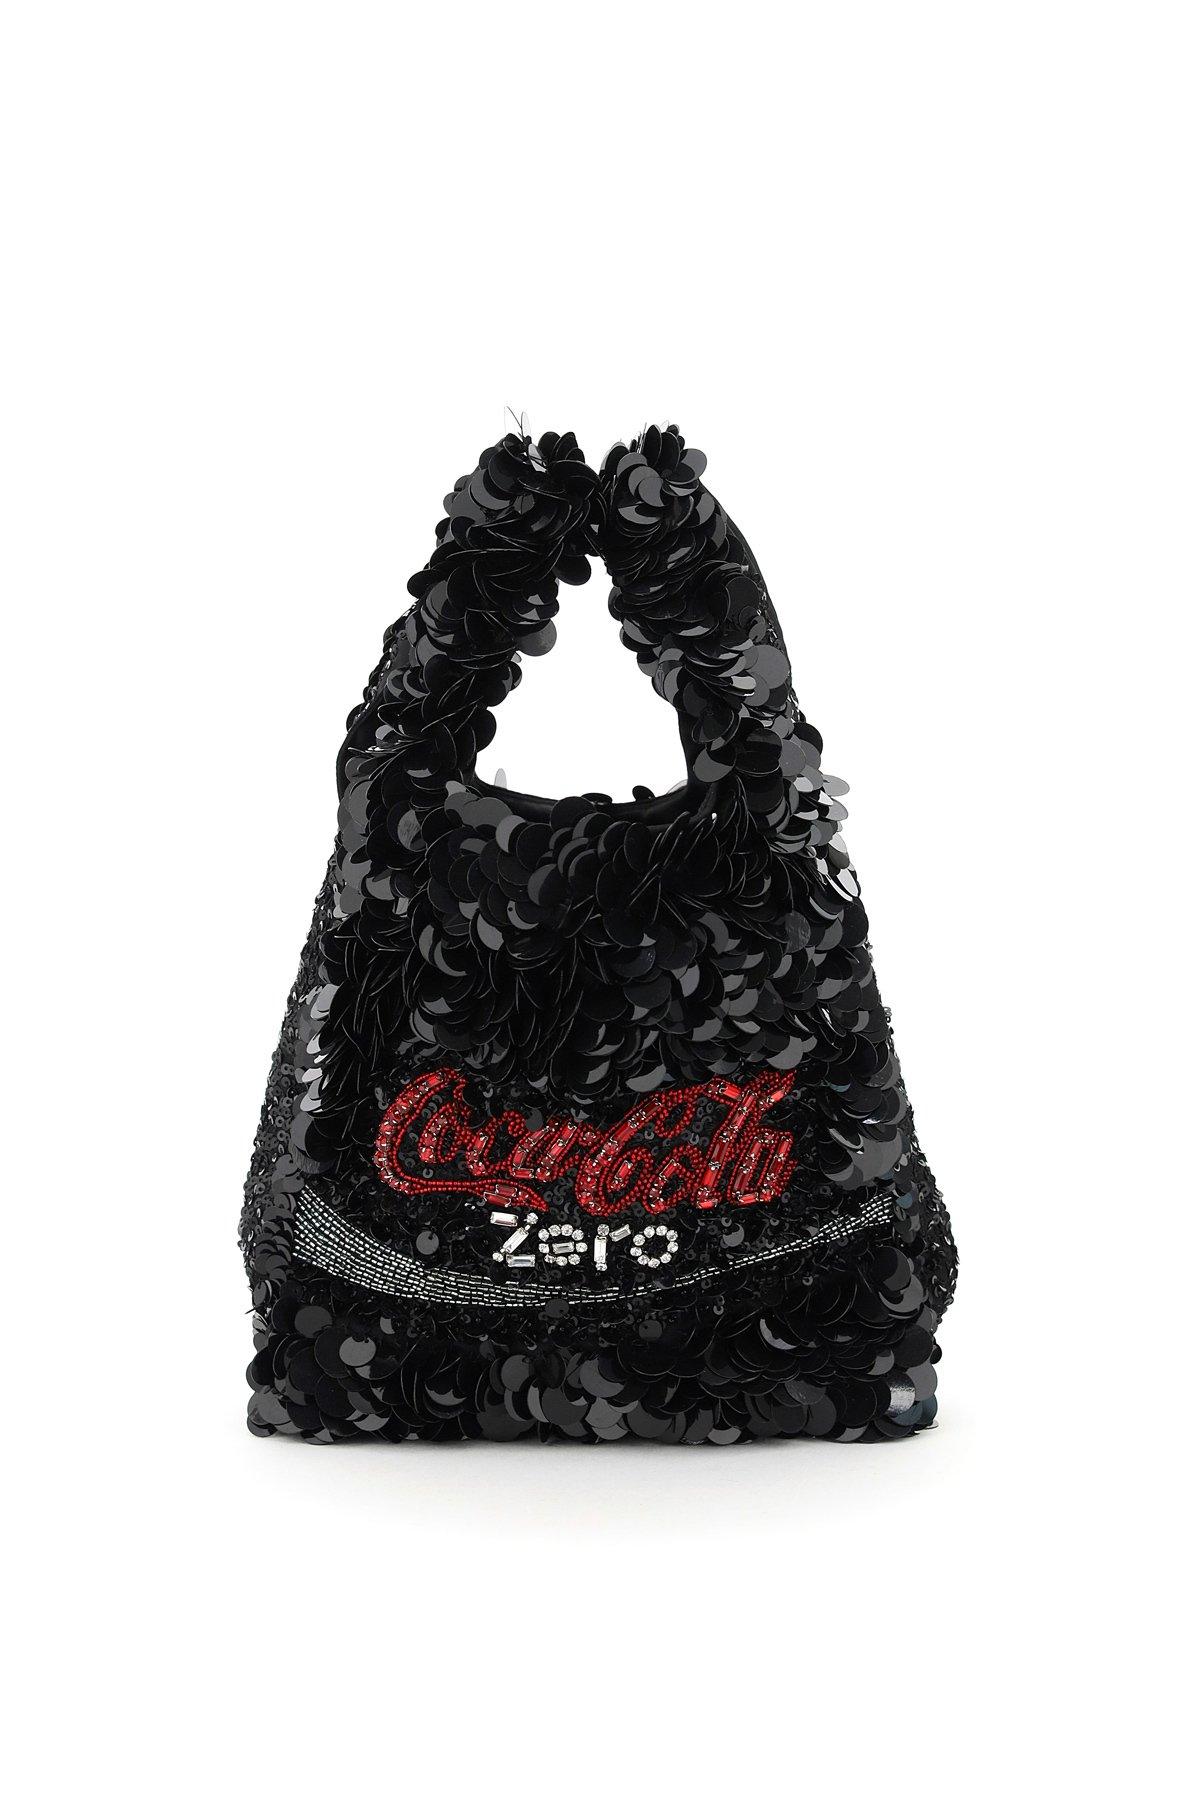 Anya hindmarch shopper mini paillettes anya brands coke zero